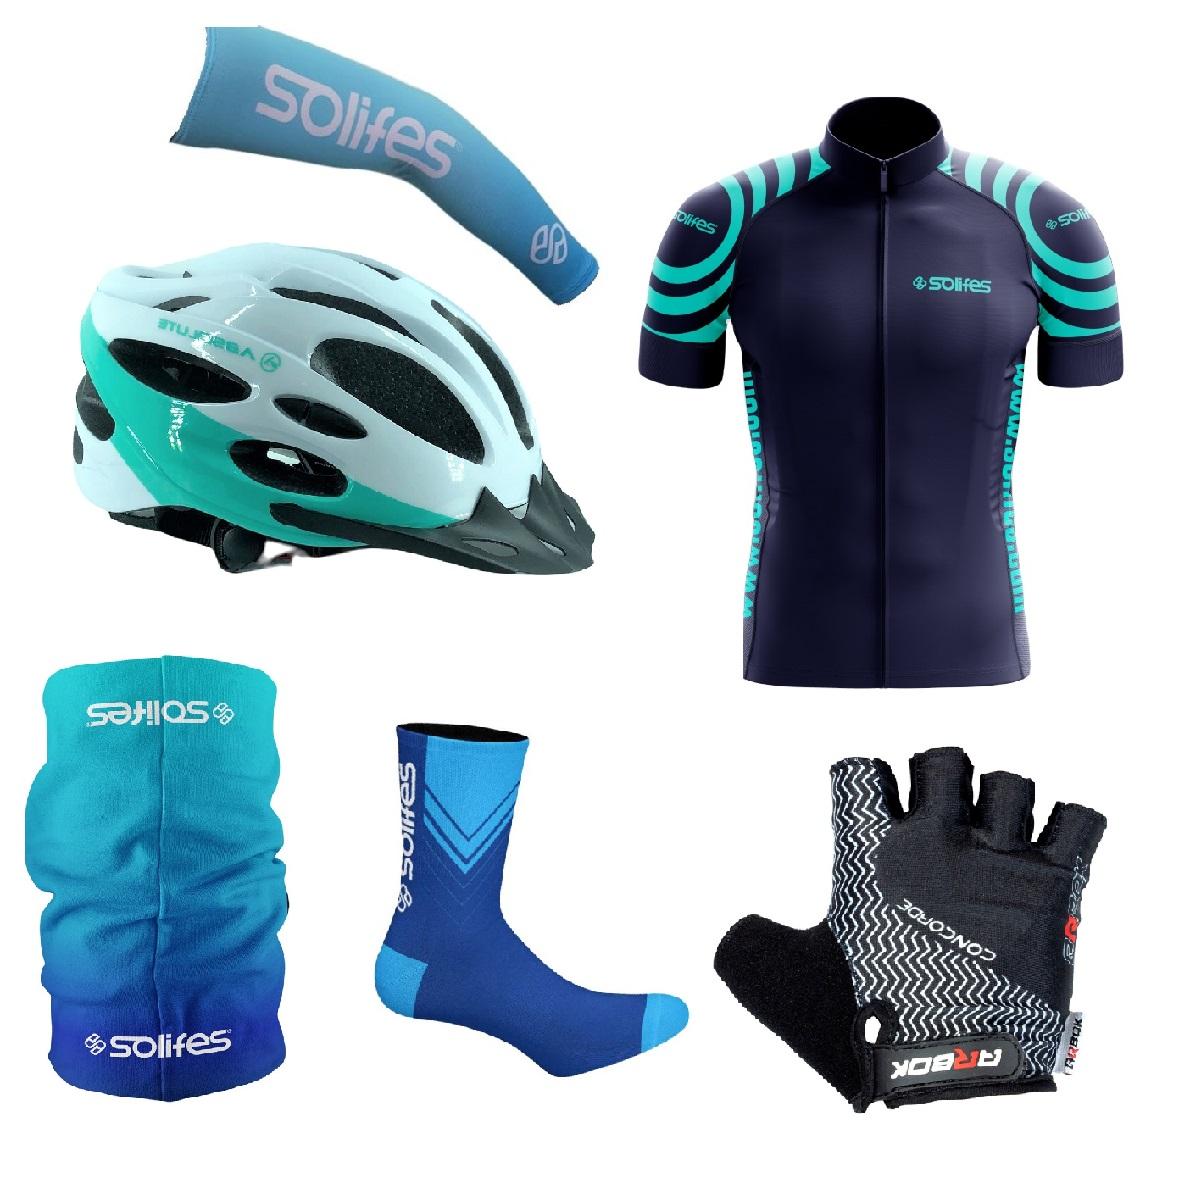 Kit Capacete Ciclismo Bike Led + Camisa + Luva + Manguito + Bandana e Meias